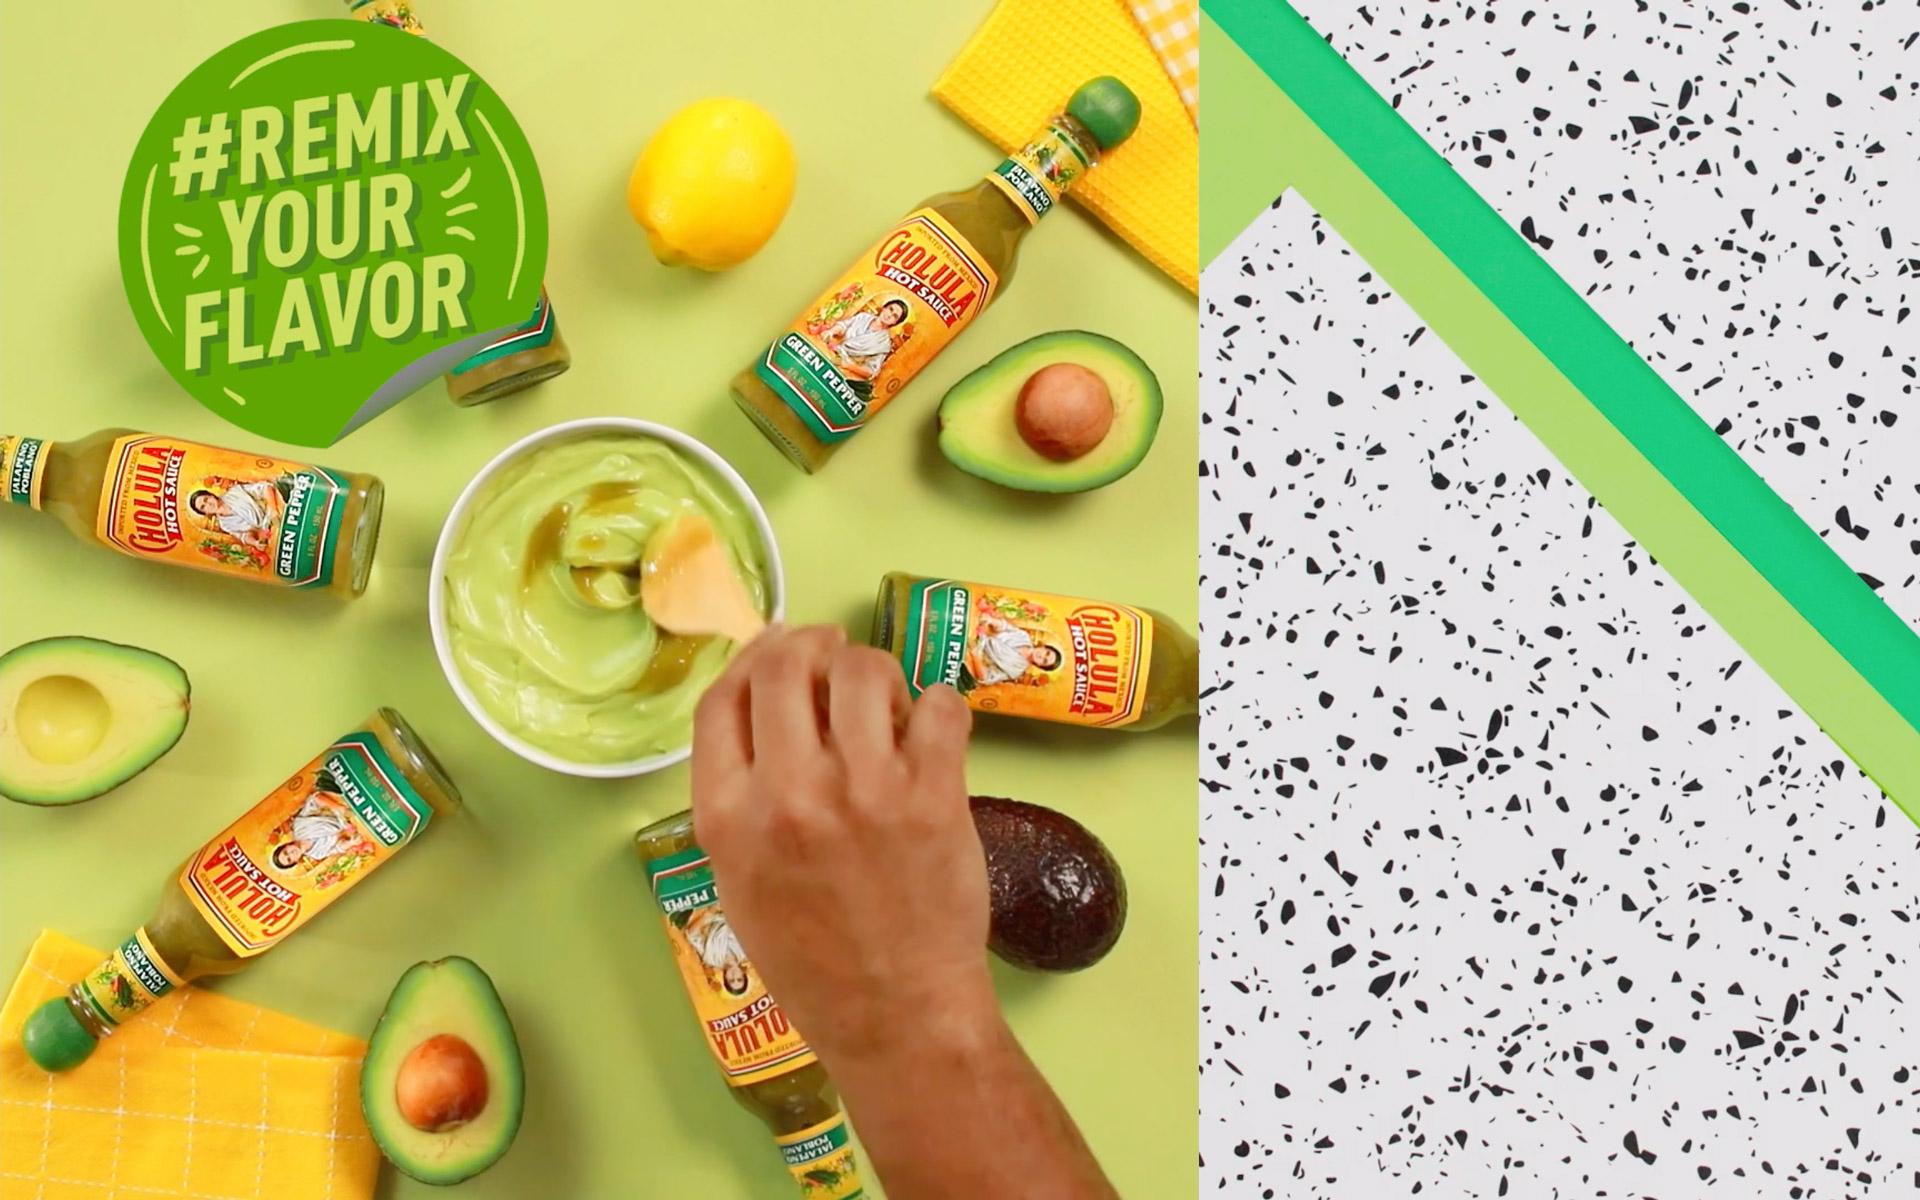 Cholula hot sauce - Mix Your Own Flavor - Fuse